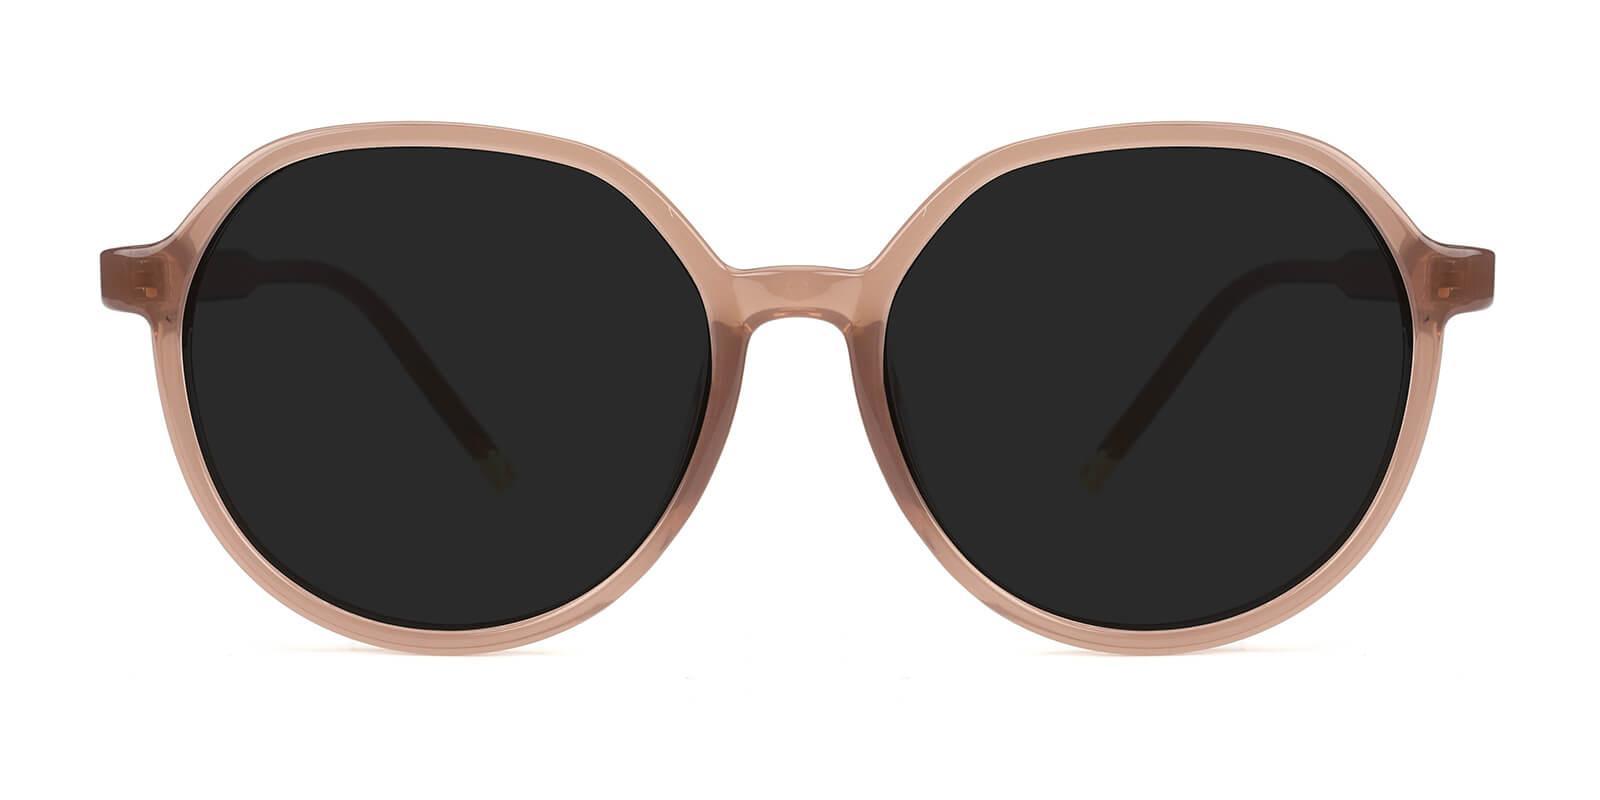 Songi-Pink-Round-TR-Sunglasses-additional2